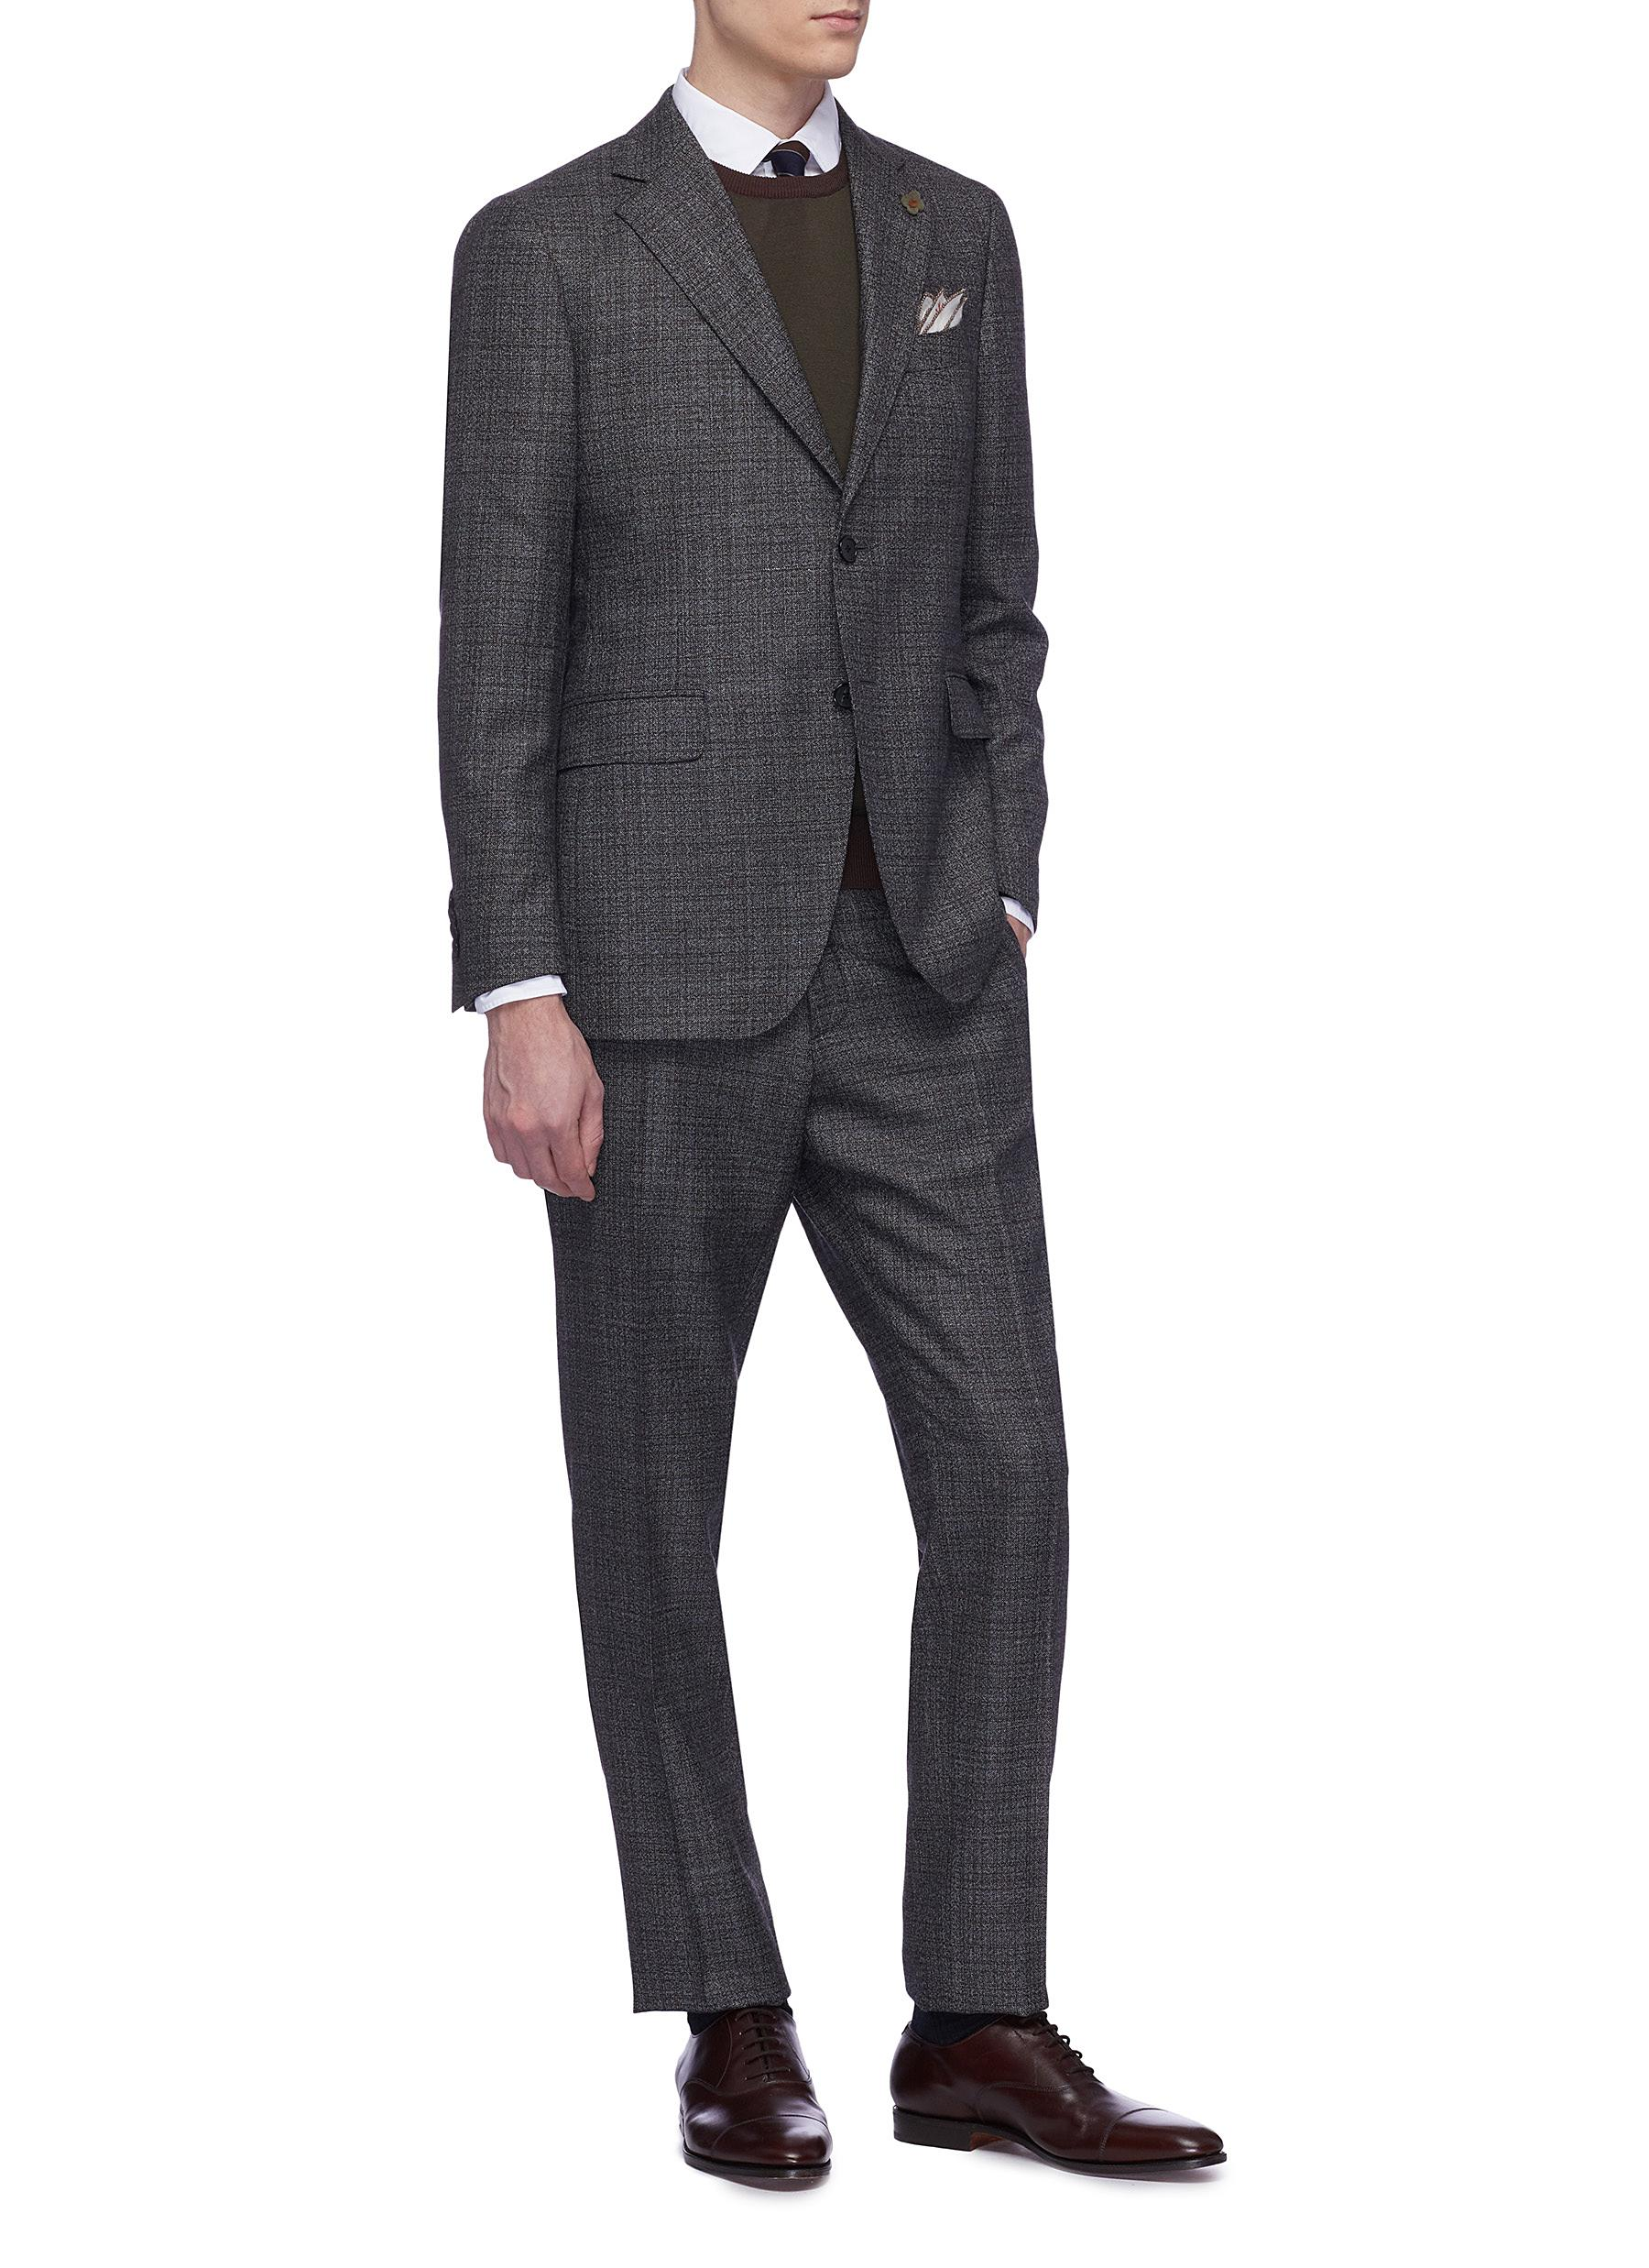 △ Lardini Check Wool Suit  US$1,735 (~HK$13,573)